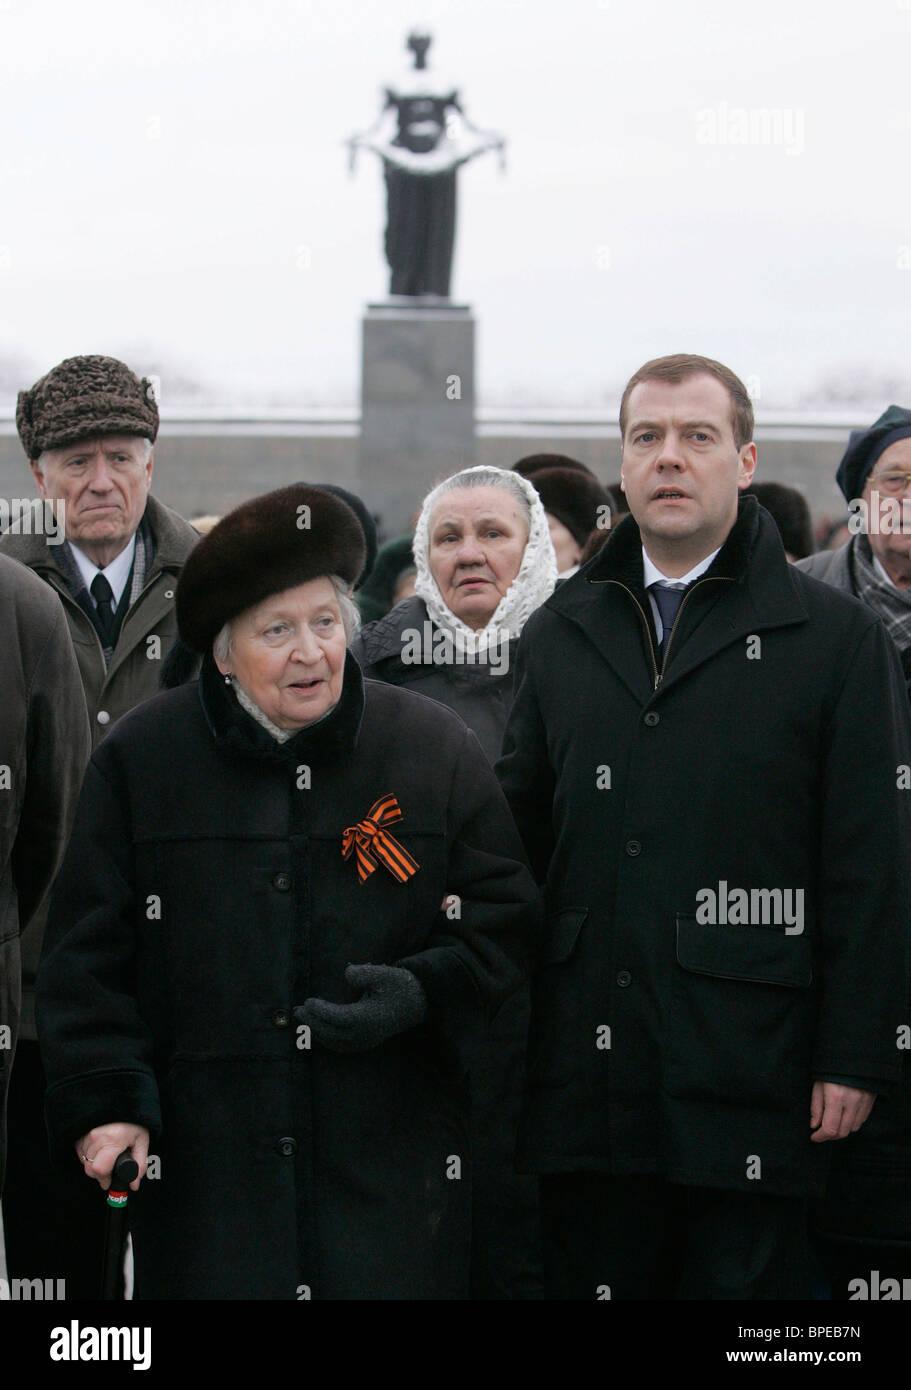 Medvedev commemorates victims of Leningrad blockade - Stock Image